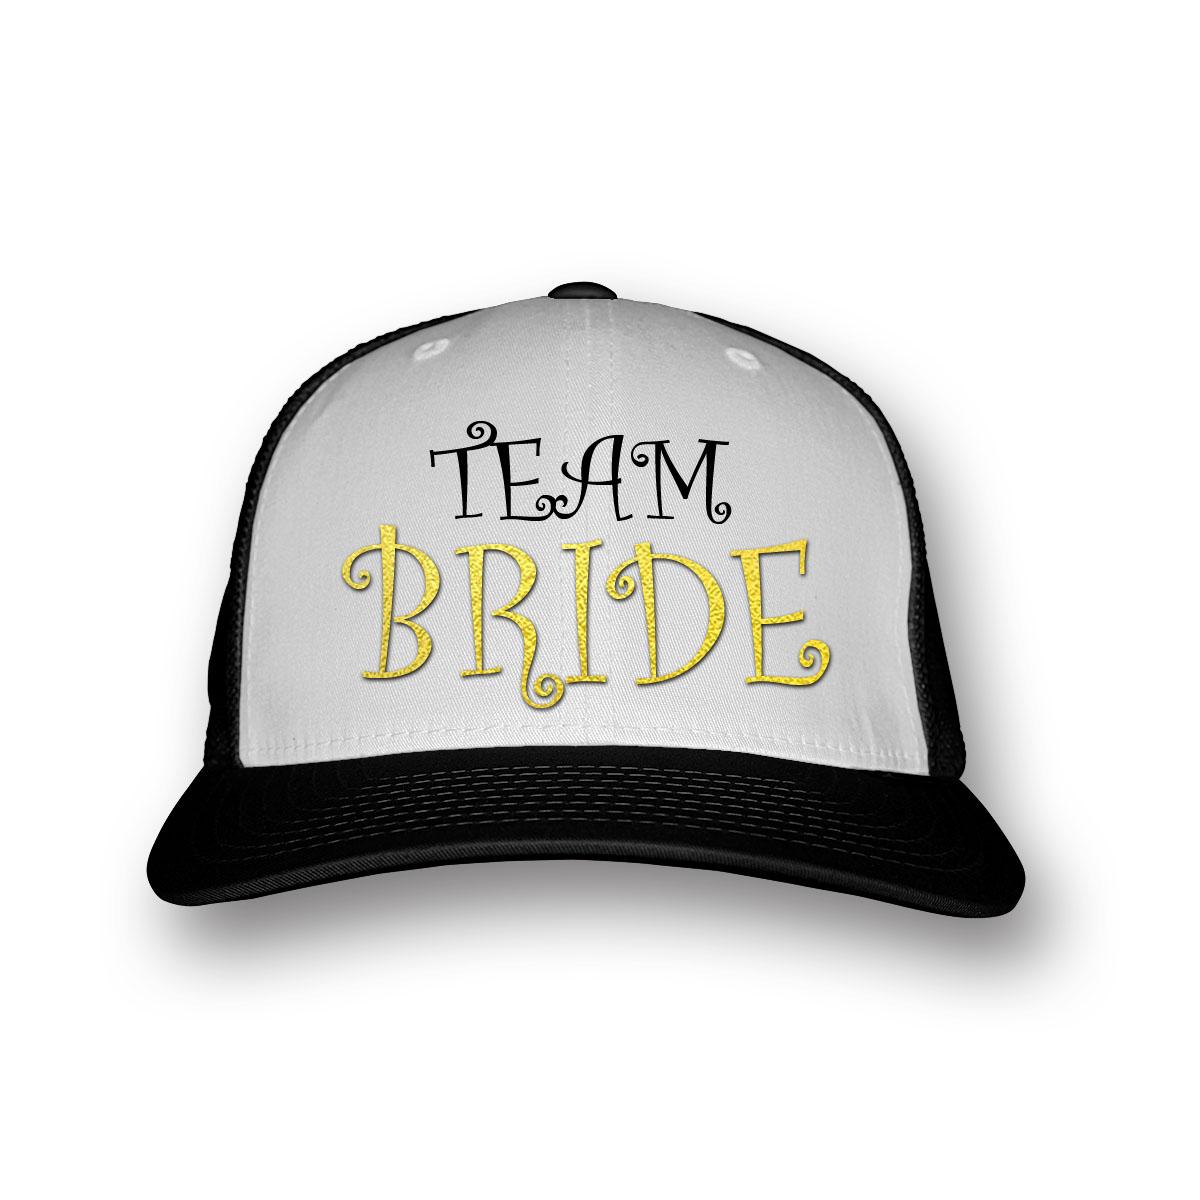 team bride baseball sapka lánybúcsúra